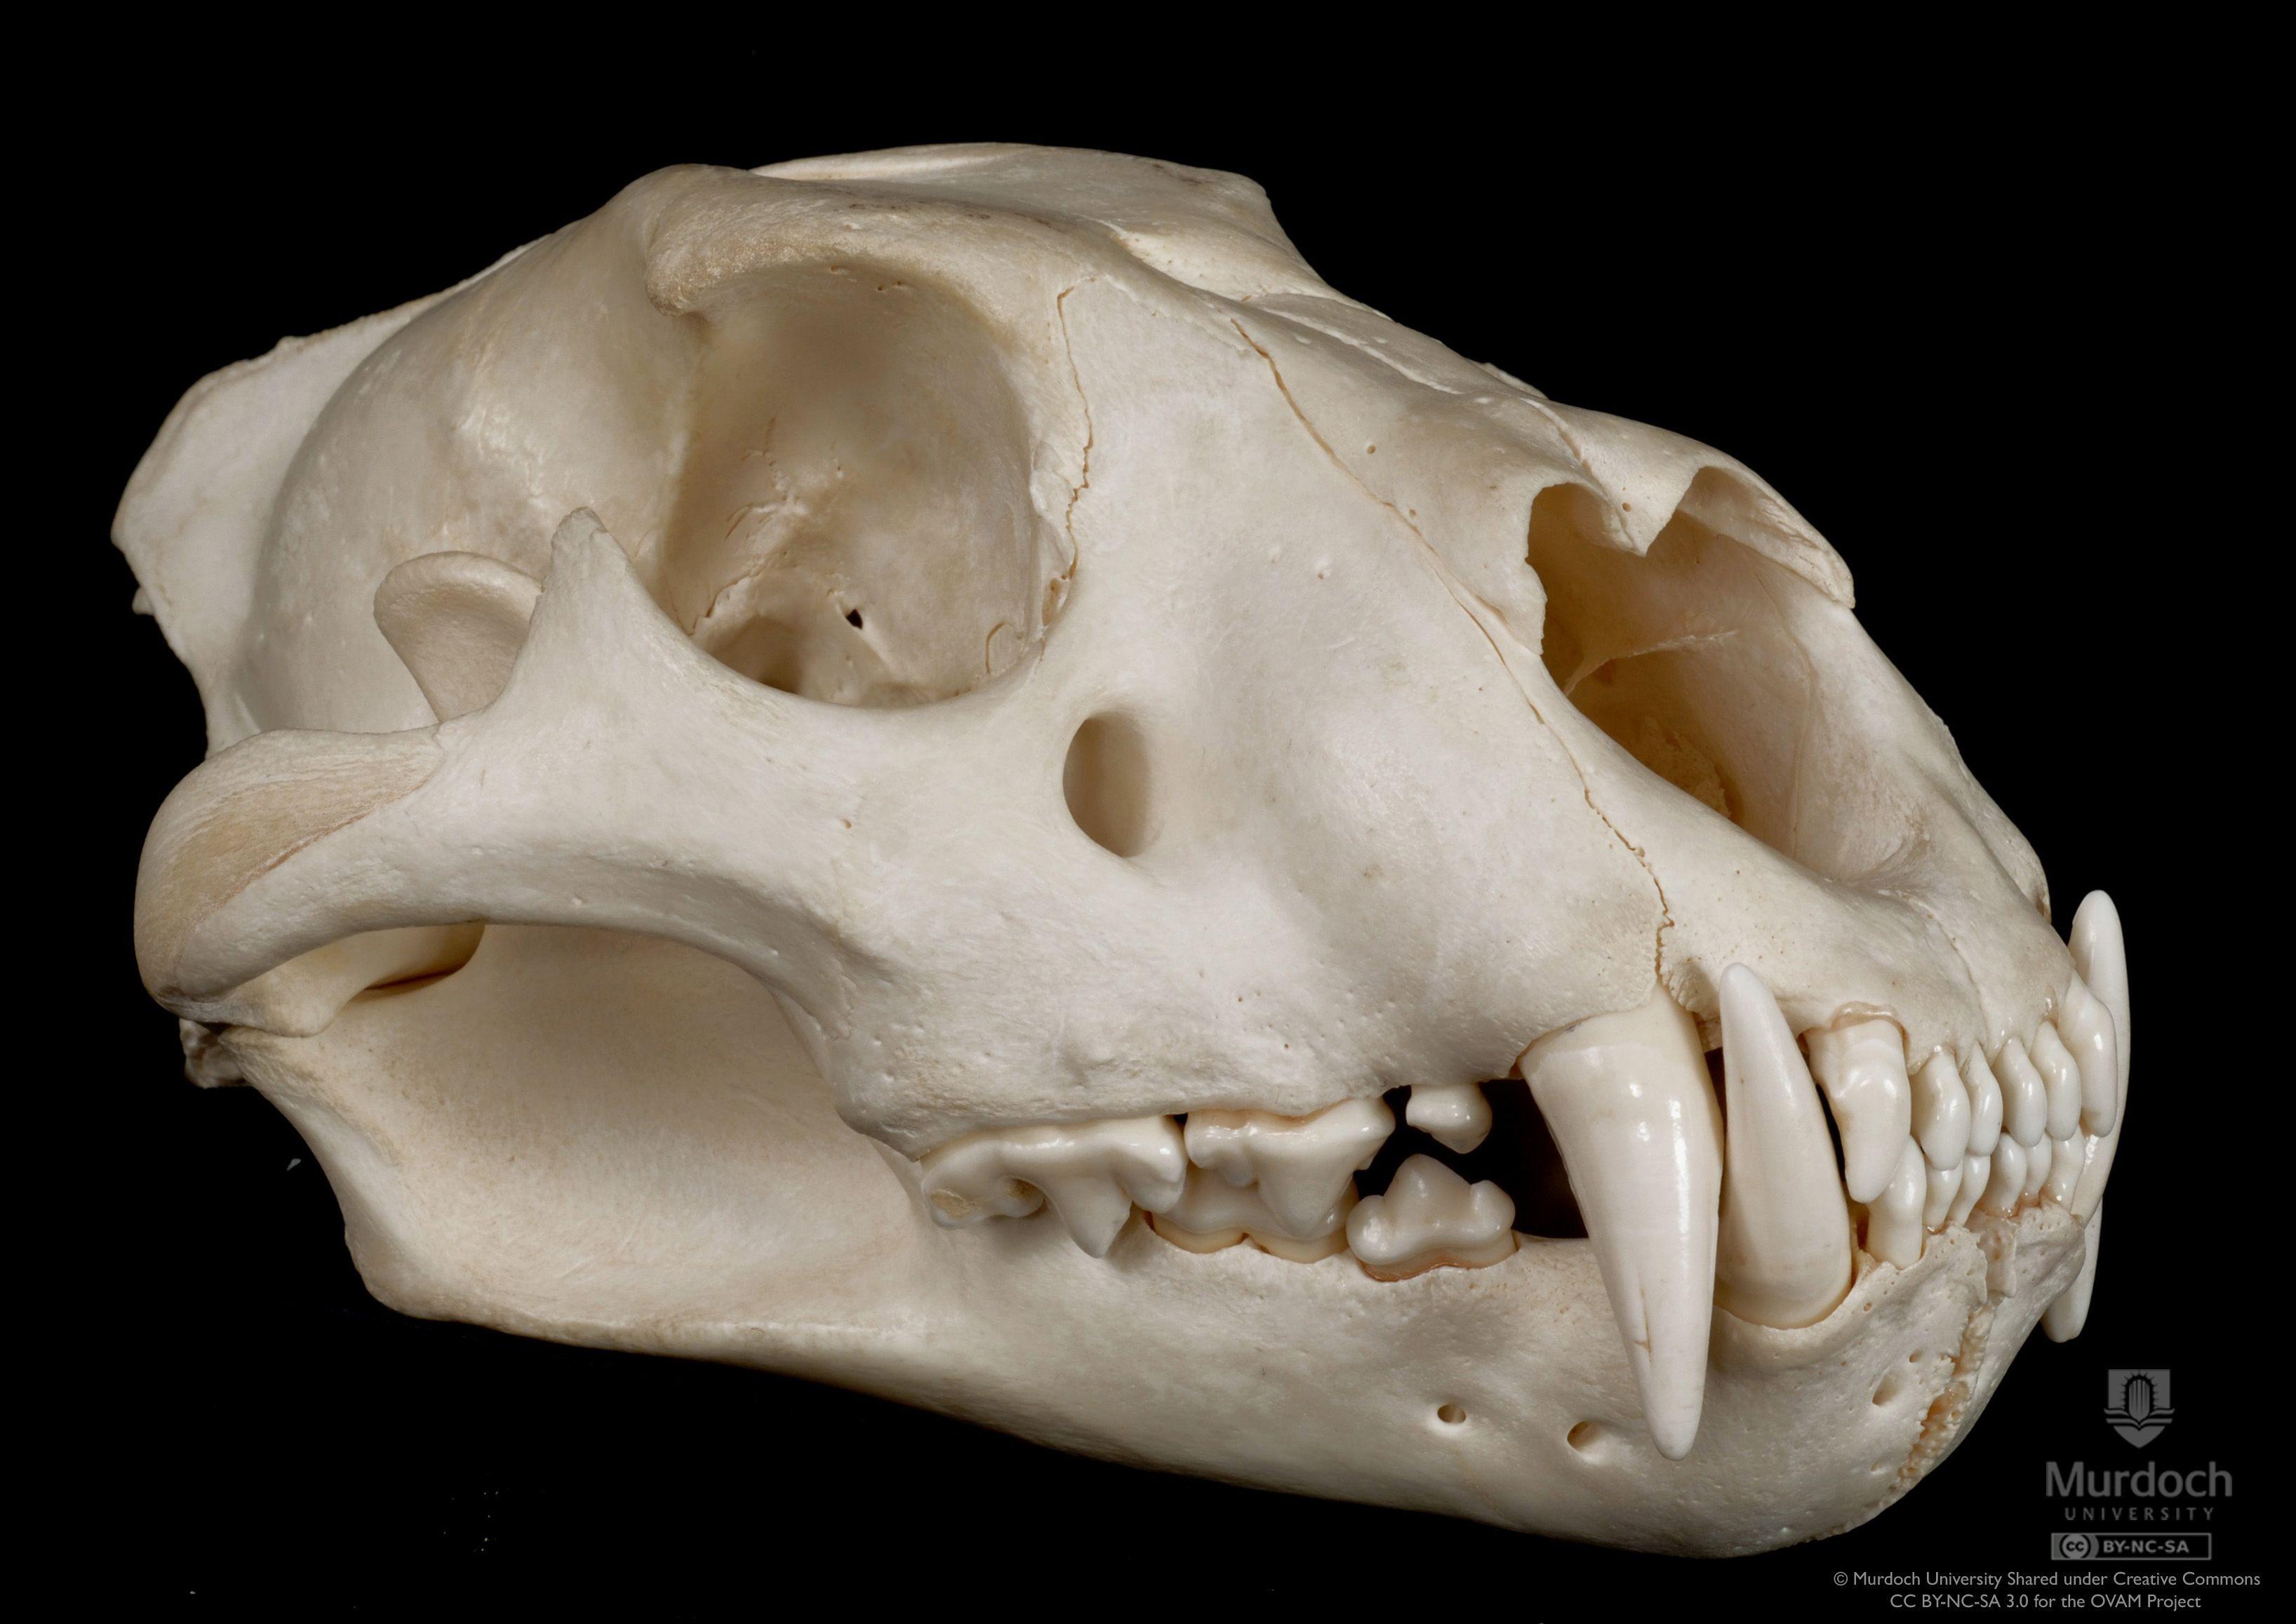 lion jaw bone - Google Search   Bones   Pinterest   Lions, Animal ...